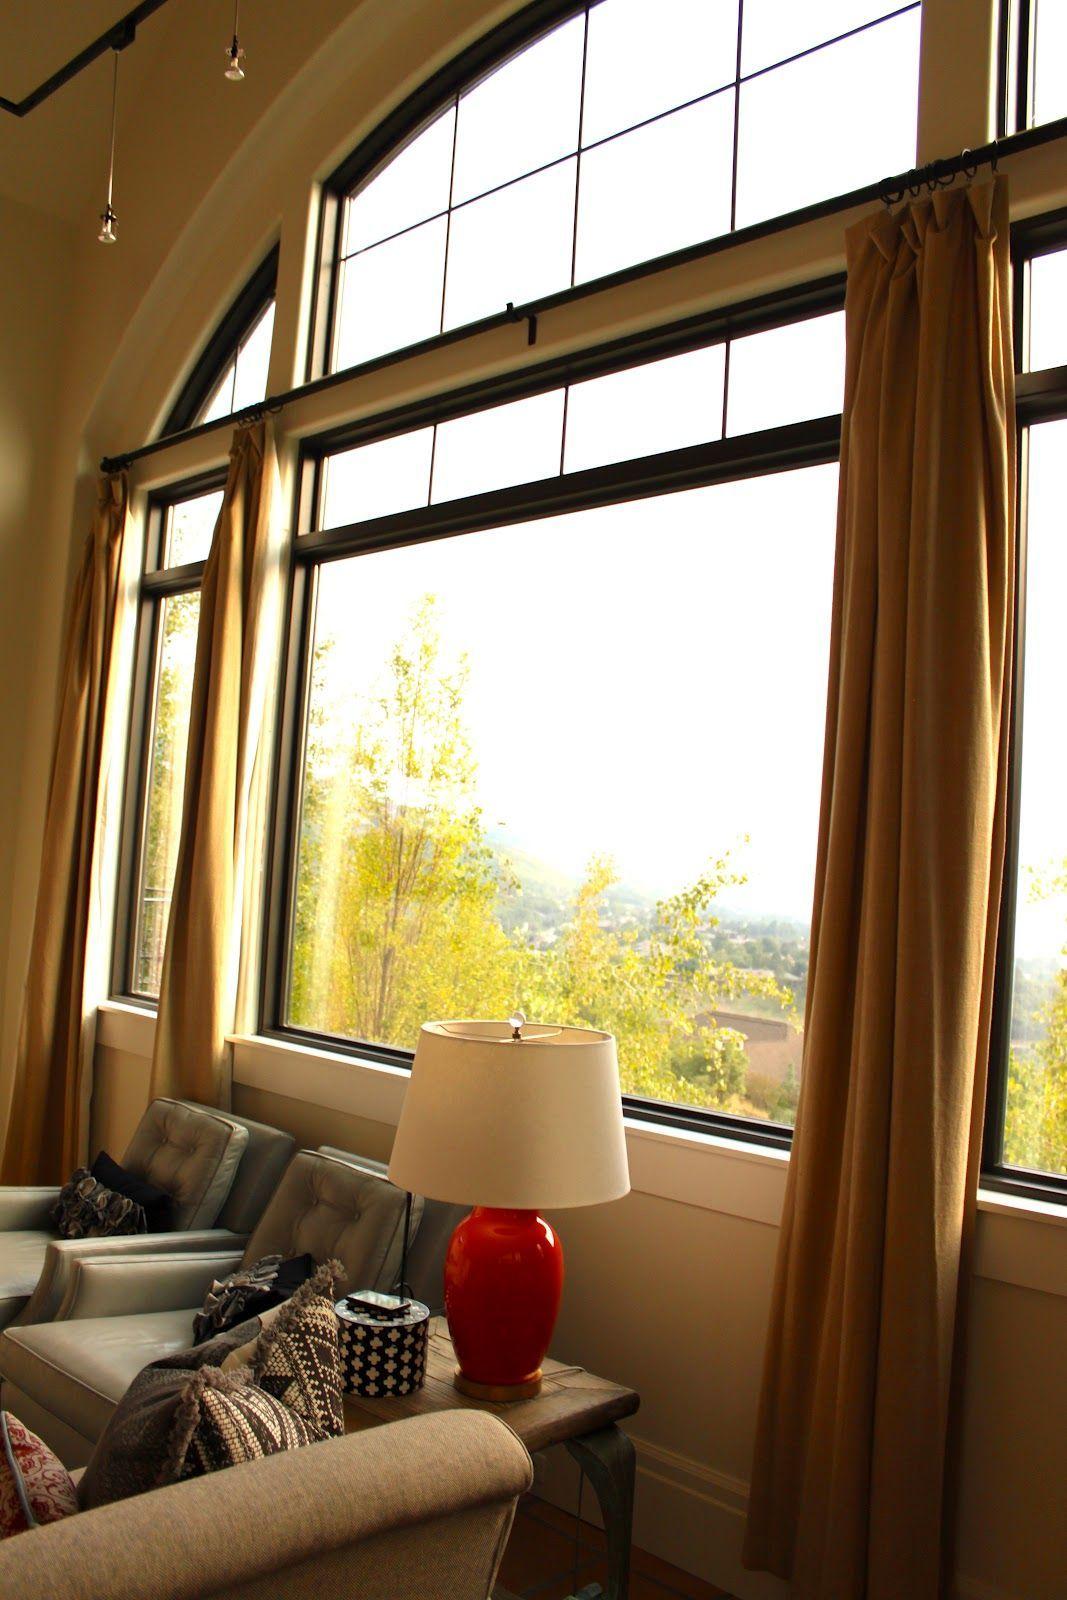 Dark sheer curtains curtains wall moderncurtains ideas design gold